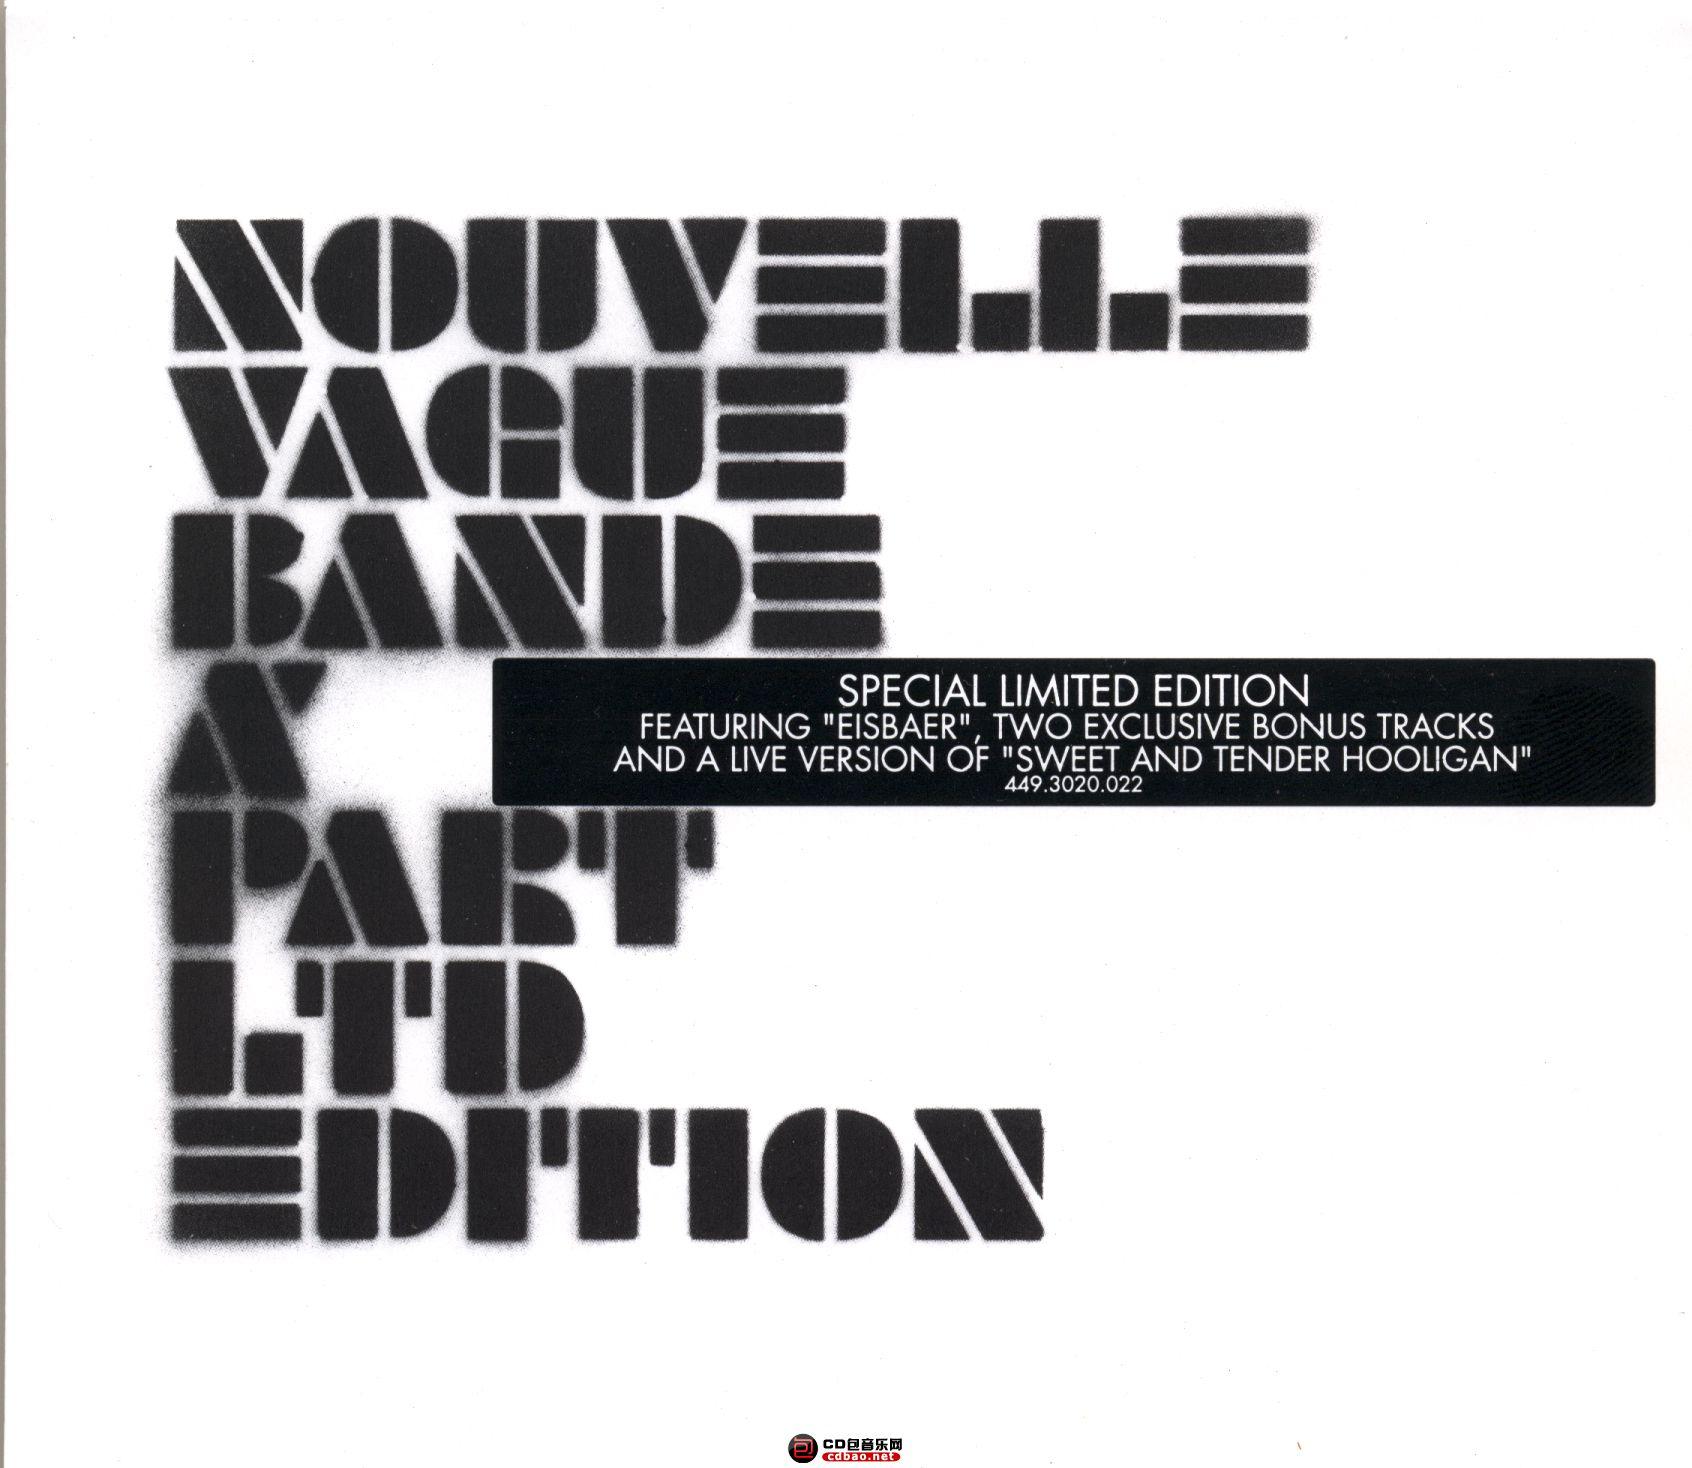 00-nouvelle_vague-bande_apart-limited_edition-cd-2006-front-csa.jpg